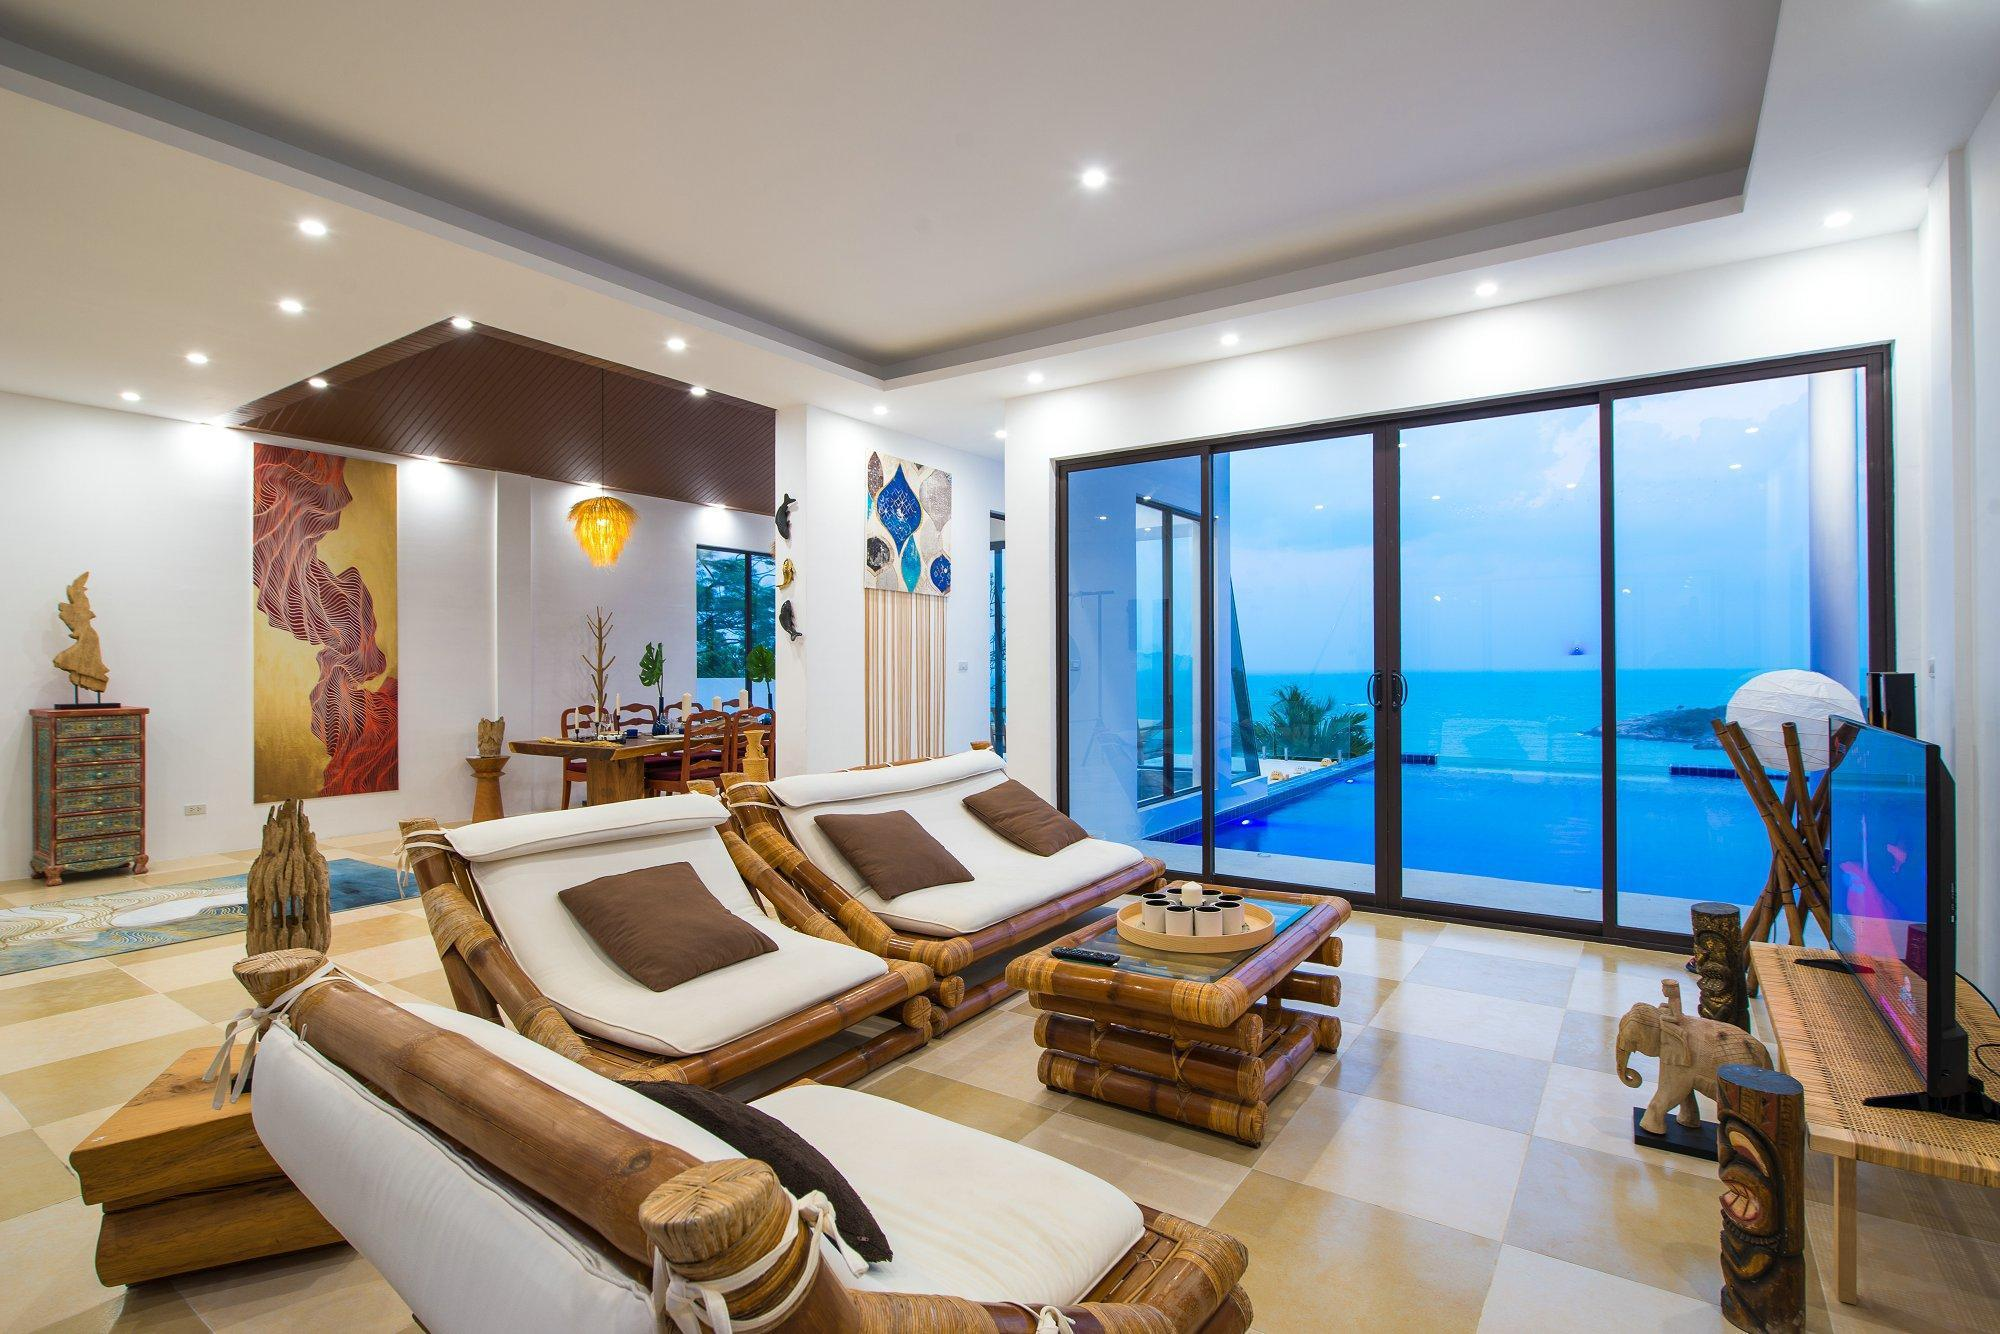 Peaceful Seaview Private Pool Villa in ChengMoeng วิลลา 6 ห้องนอน 7 ห้องน้ำส่วนตัว ขนาด 750 ตร.ม. – เชิงมน